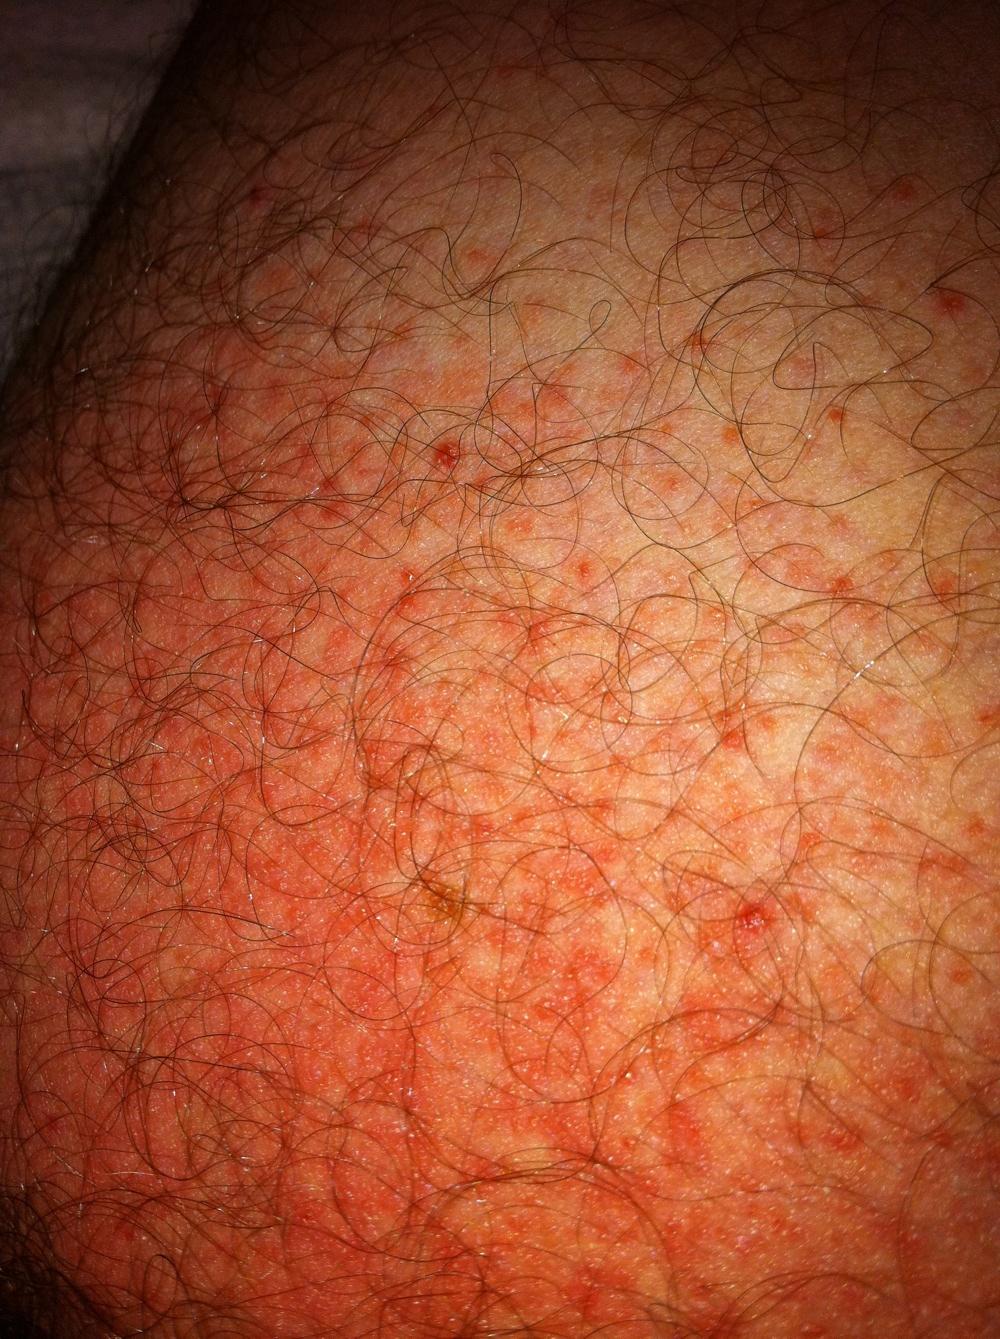 Penis And Scrotum Rash - Mens Conditions Forum -